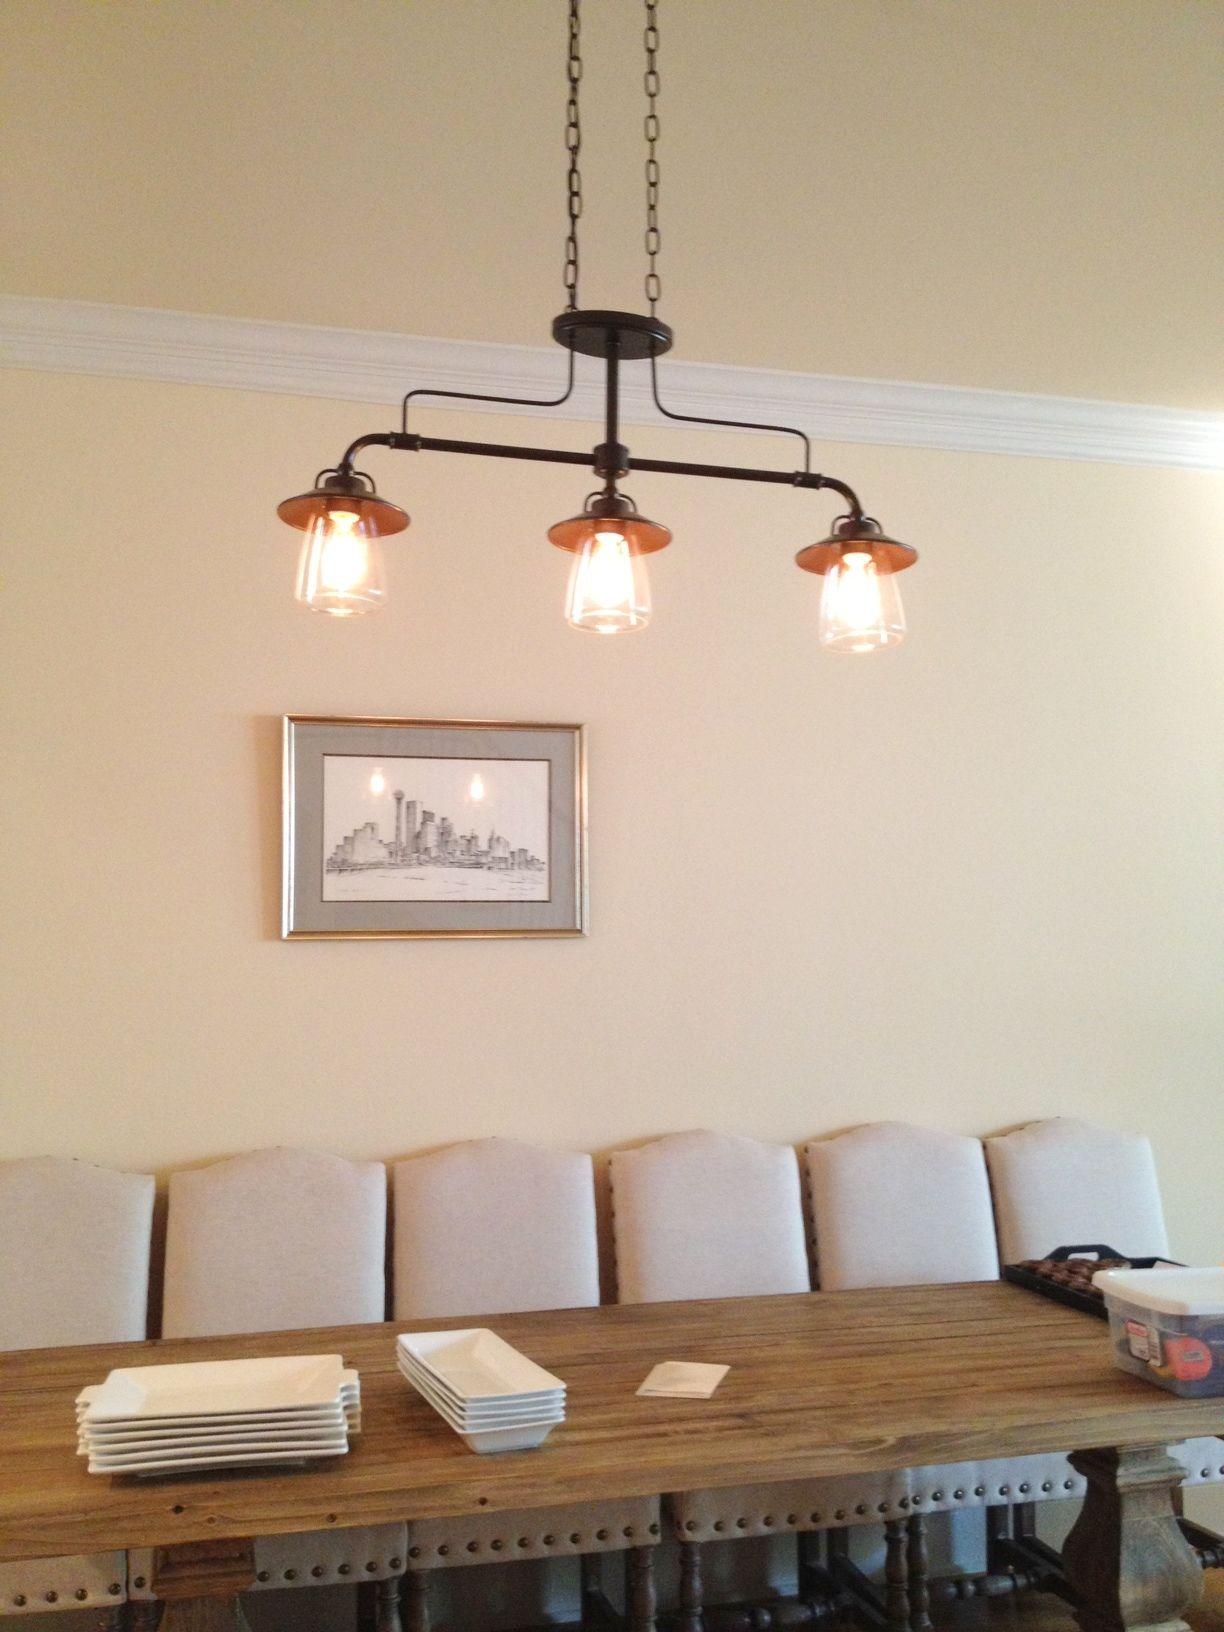 17 Best images about Edison light bulb fixtures on Pinterest | Glow, Island  pendants and Pendants